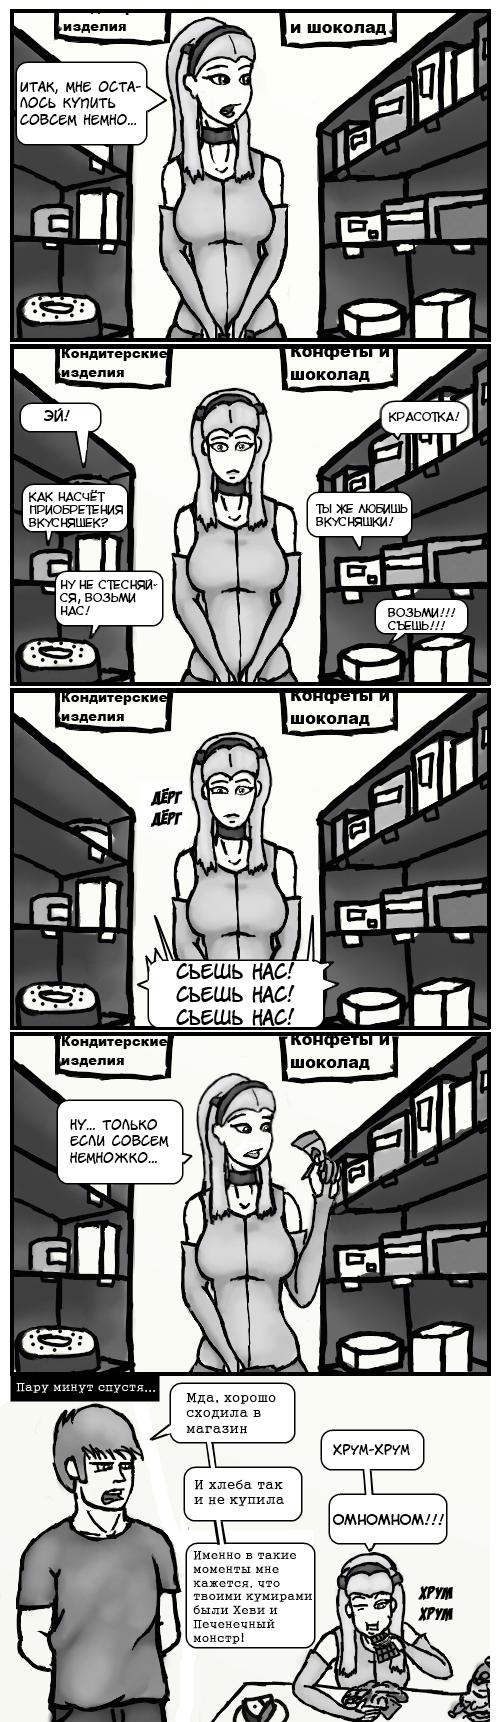 Комикс битва №16 выпуск 52